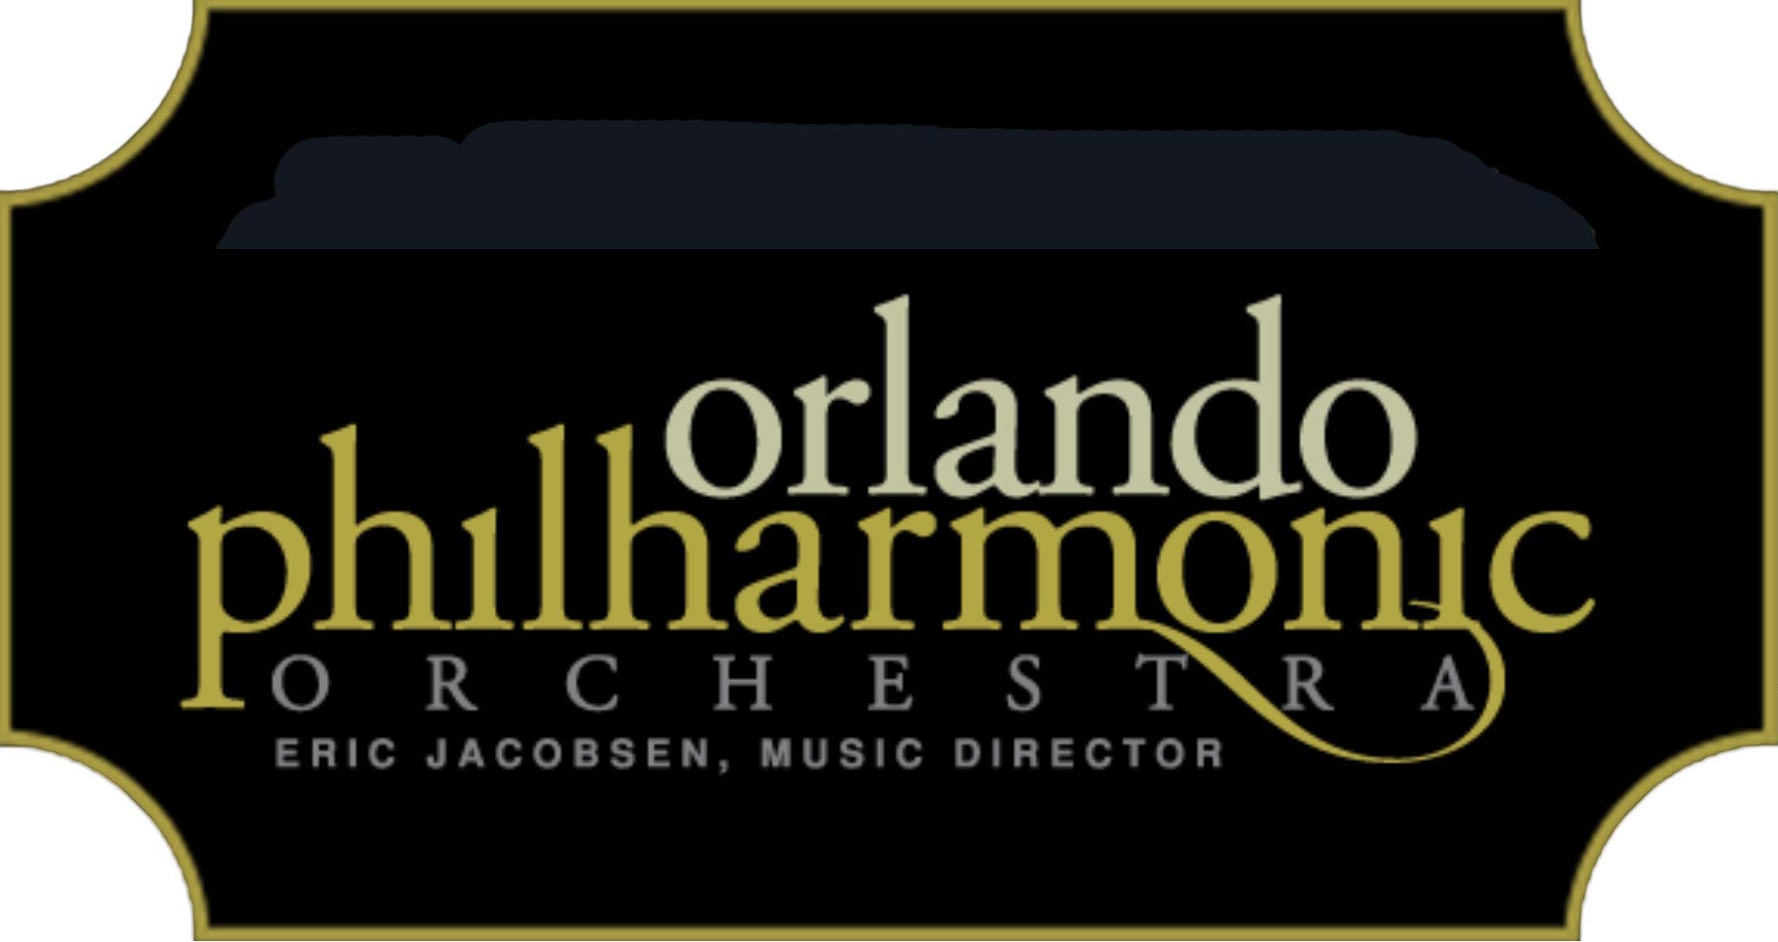 Orlando Philharmonic logo in ticket shape